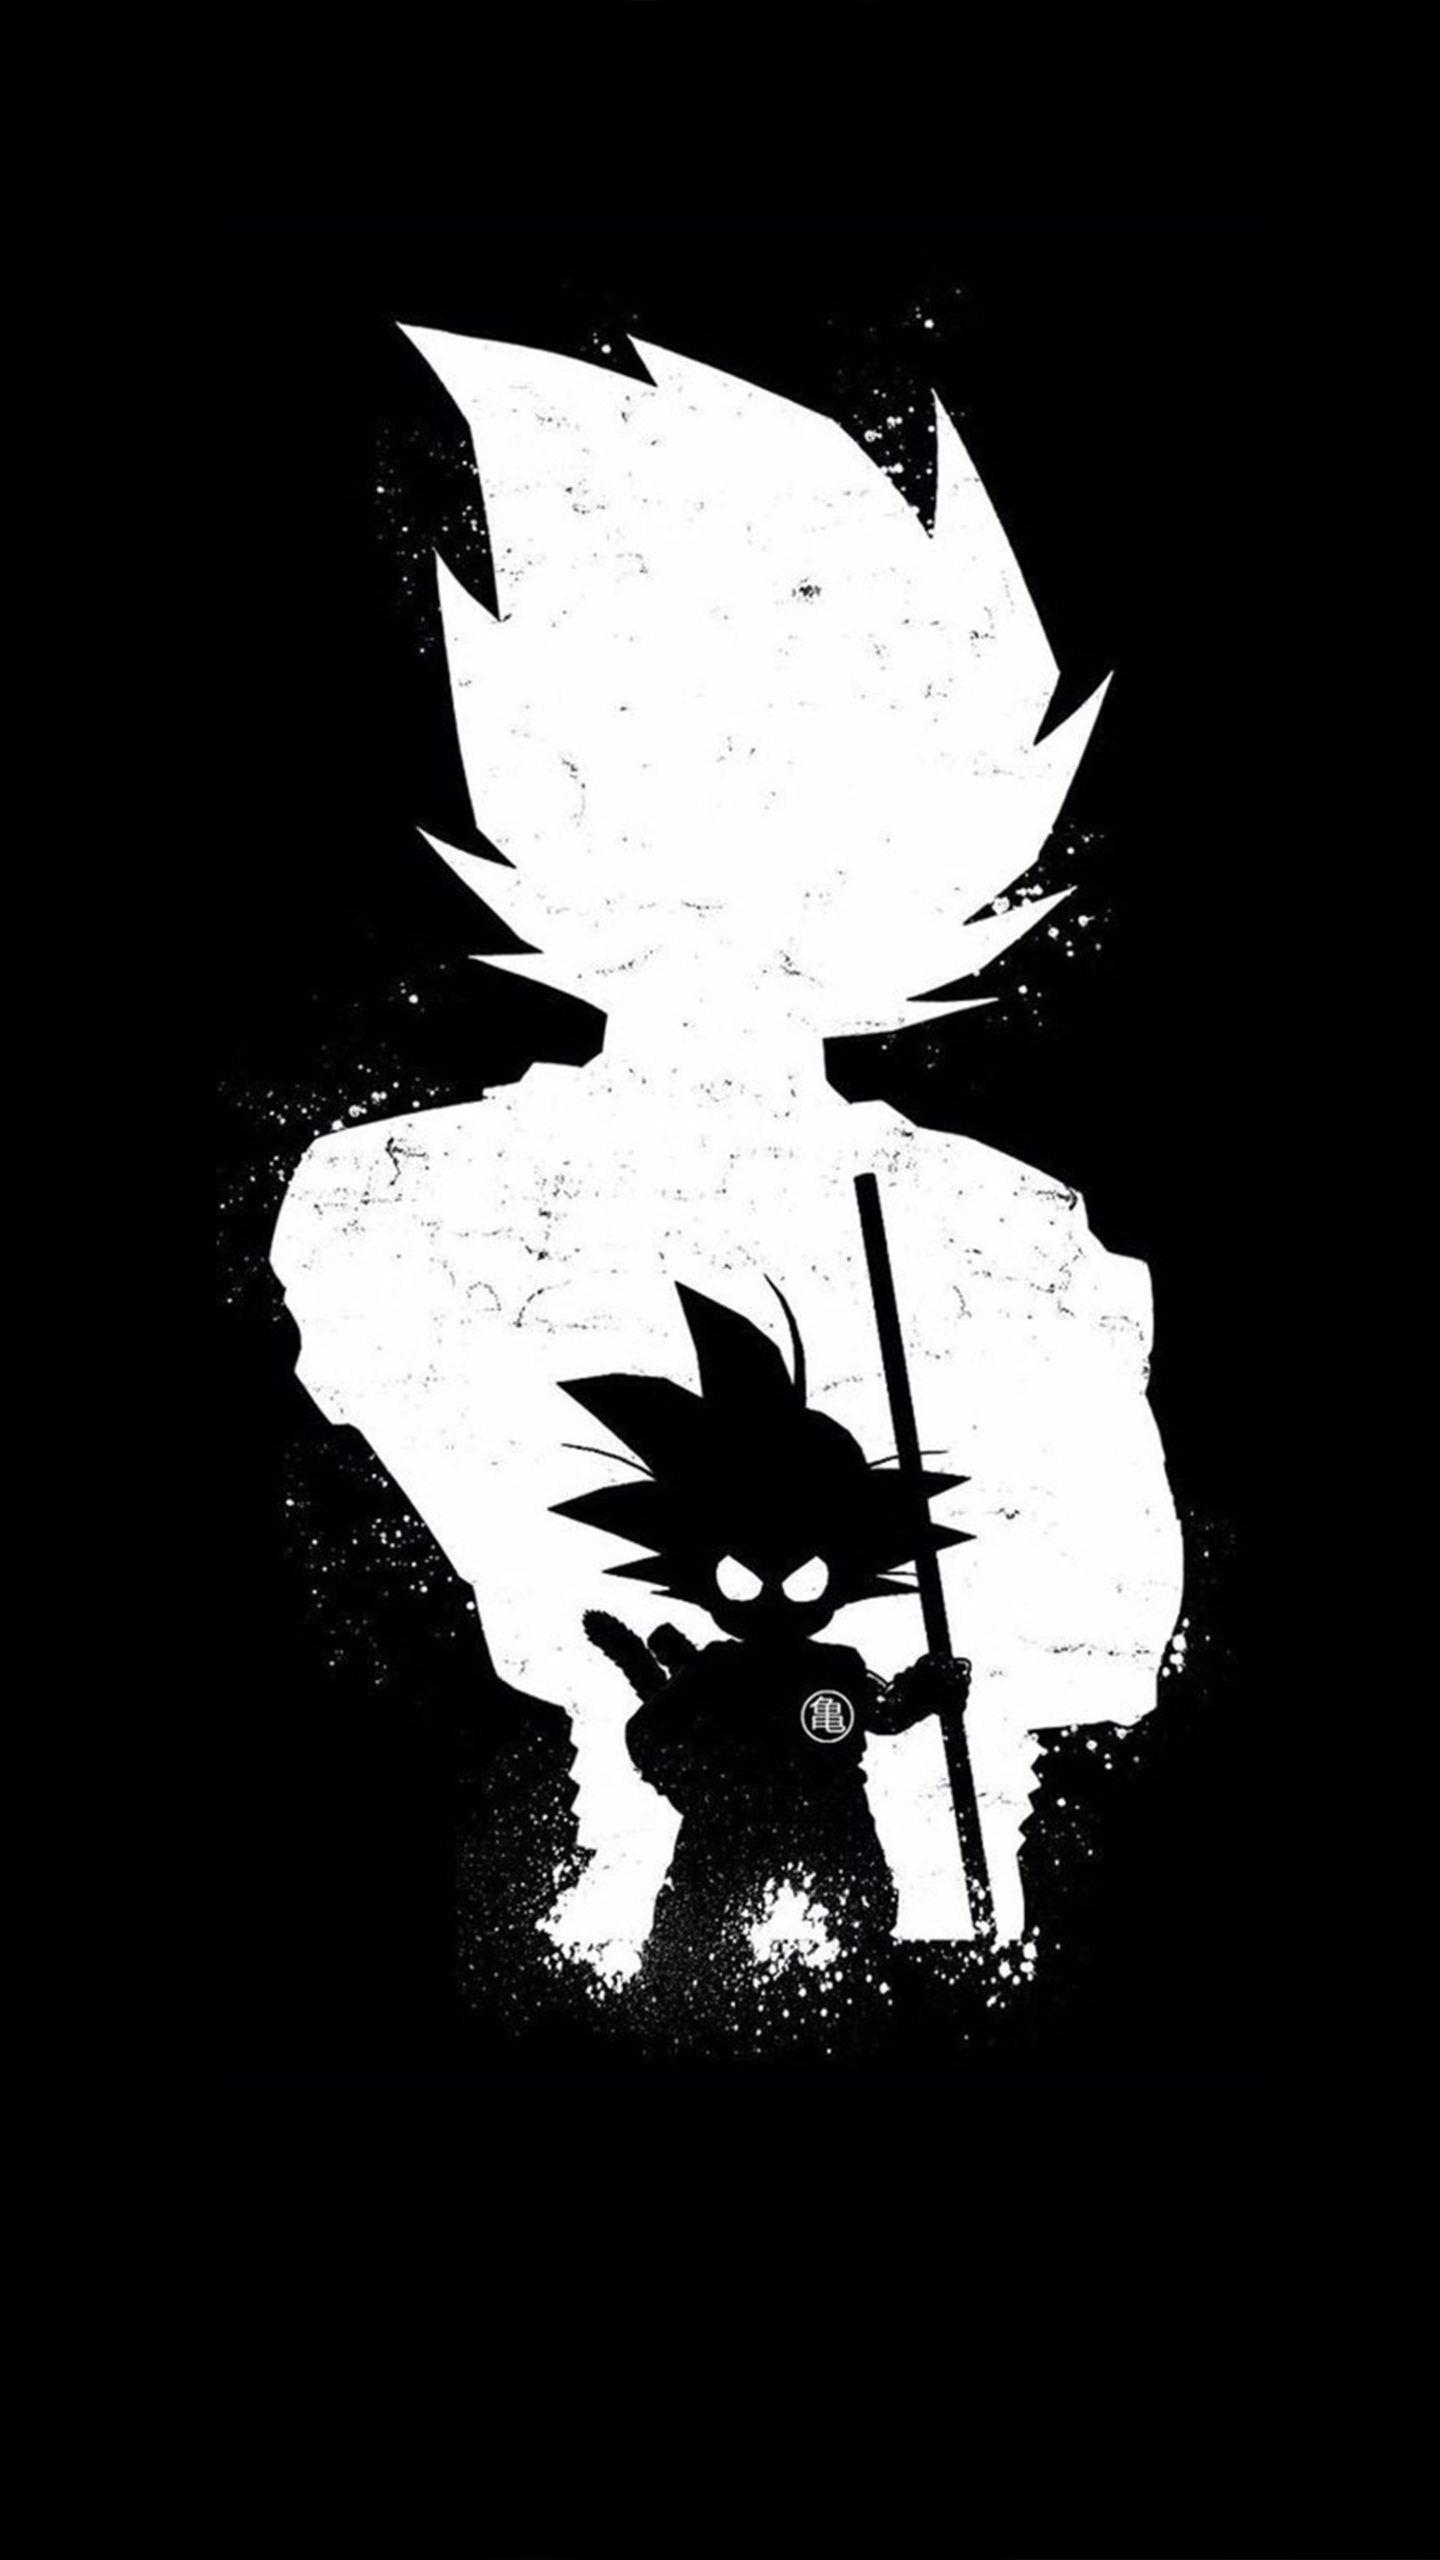 Goku Dark Black Minimal 4k Ultra Hd Mobile Wallpaper Anime Wallpaper Dragon Ball Wallpapers Goku Wallpaper